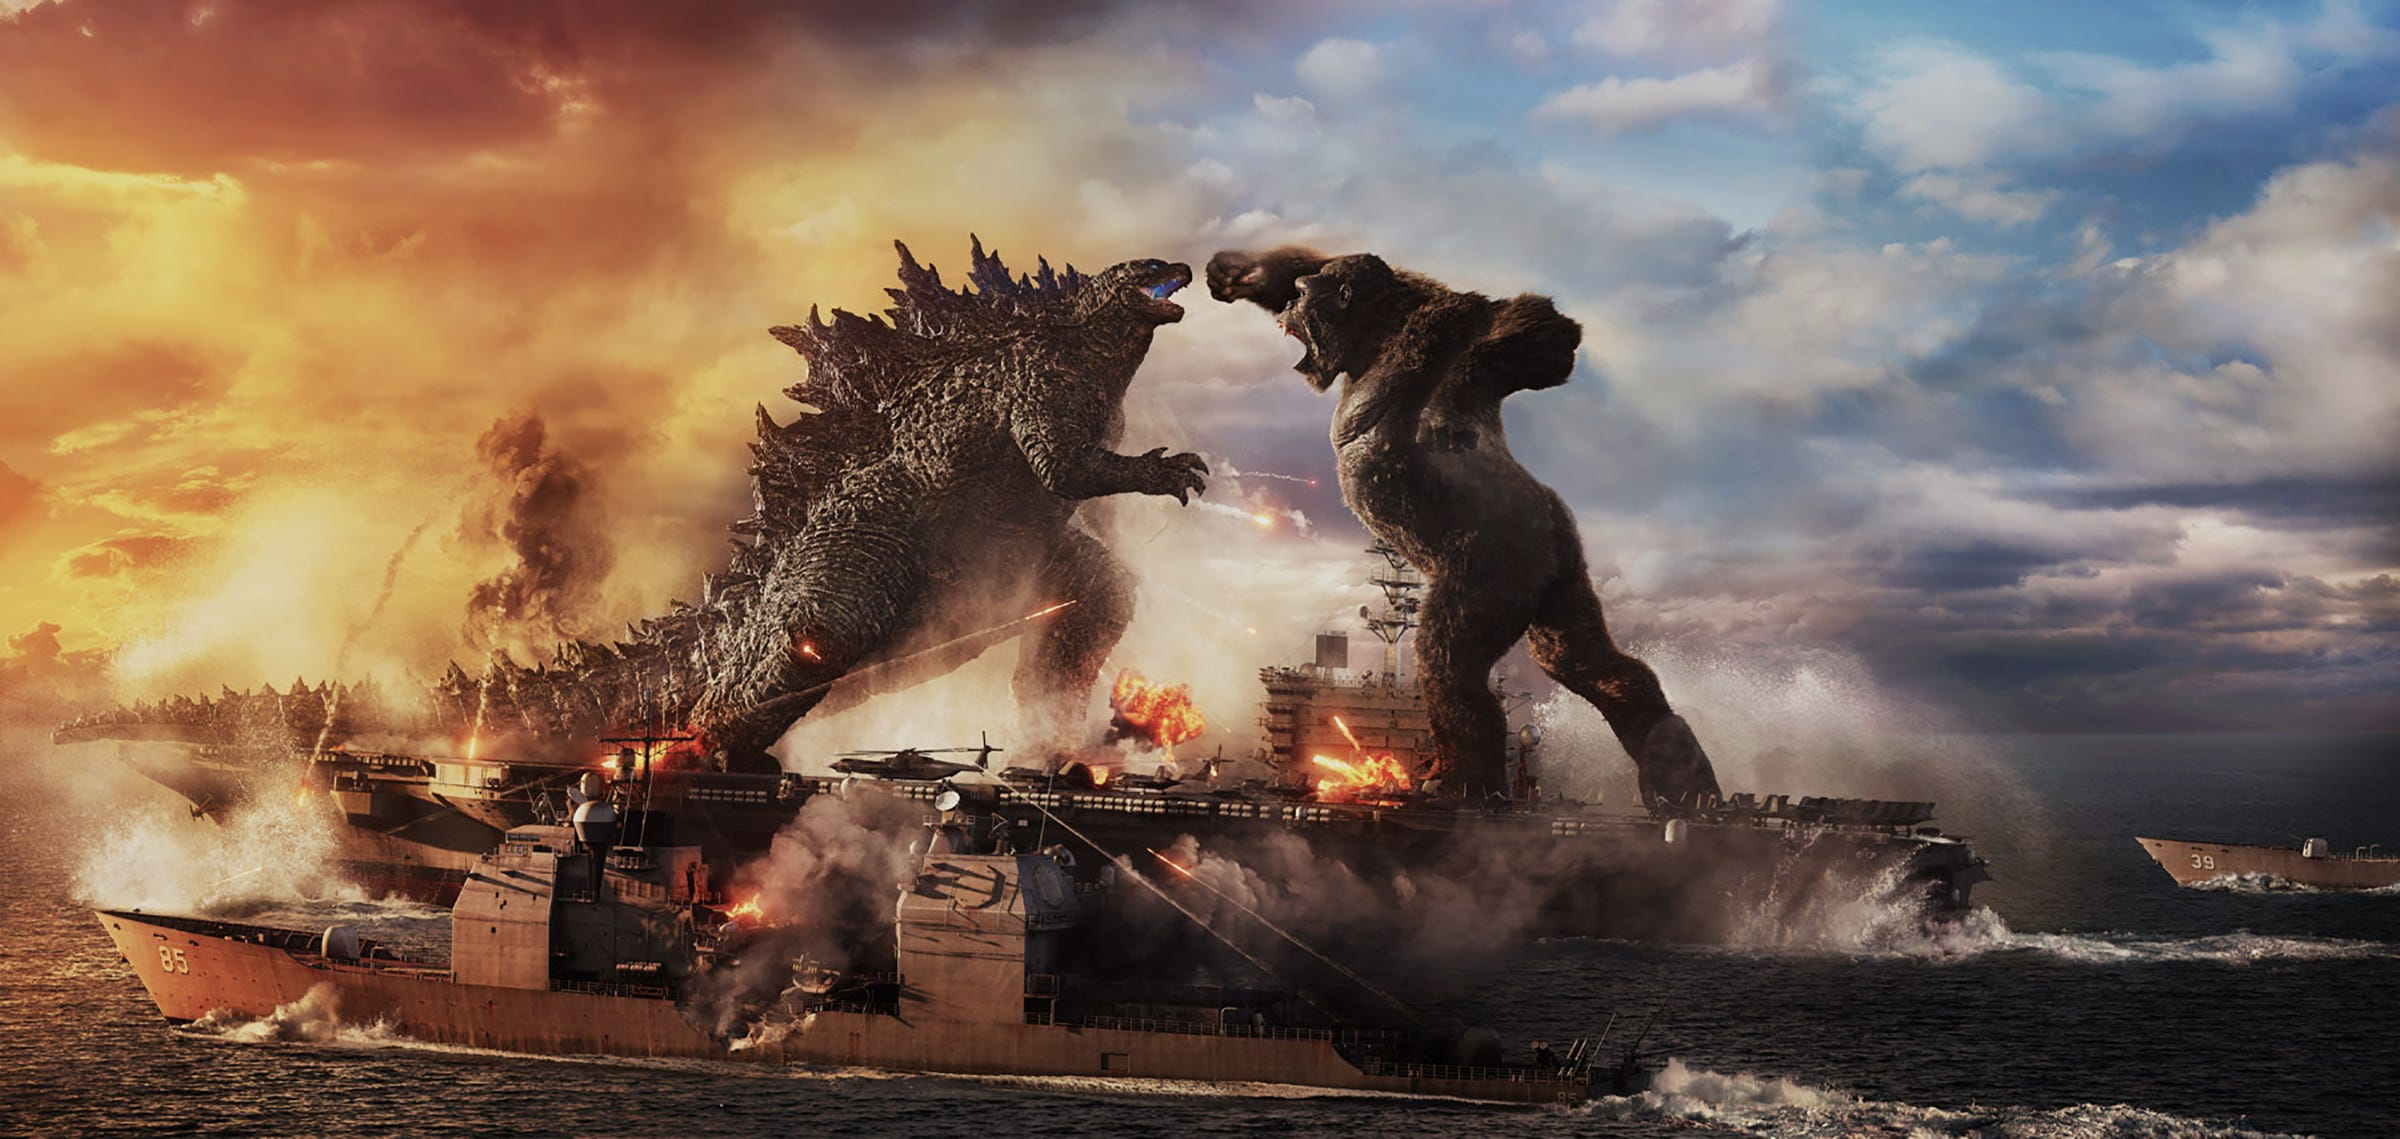 'Godzilla Vs. Kong' Ending Explained: Who Wins the Final Battle?